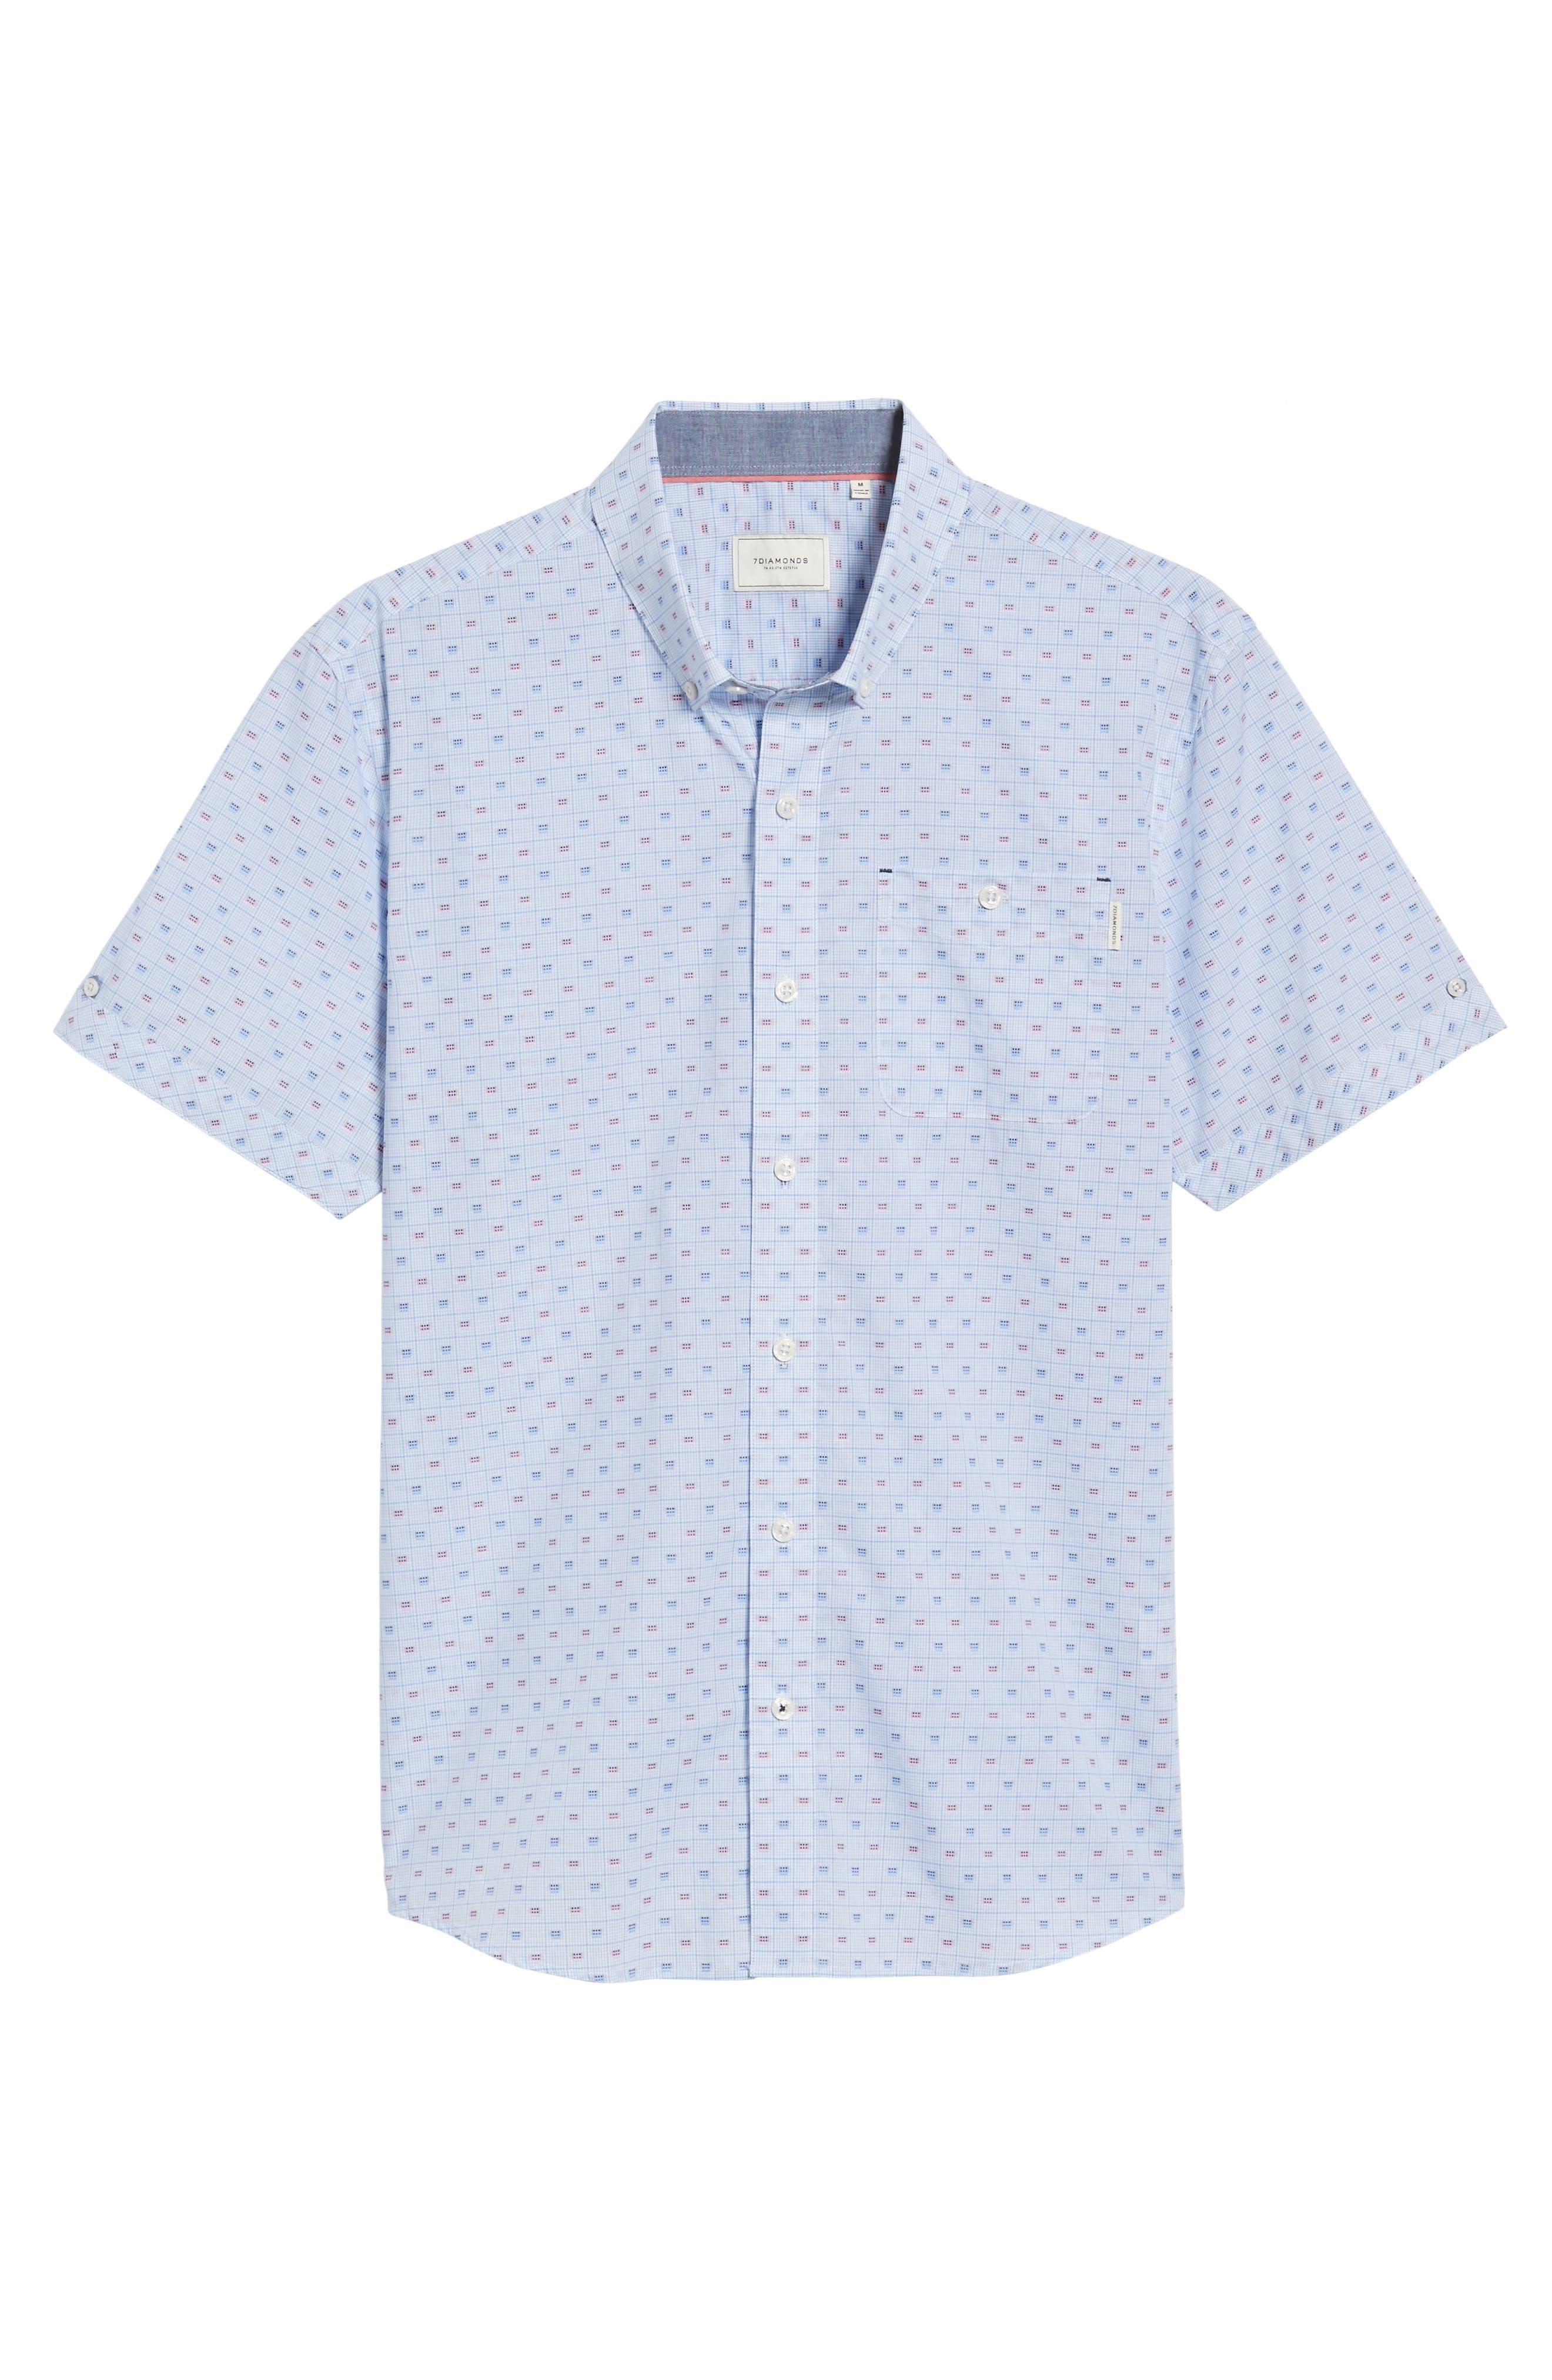 Atmosphere Woven Shirt,                             Alternate thumbnail 6, color,